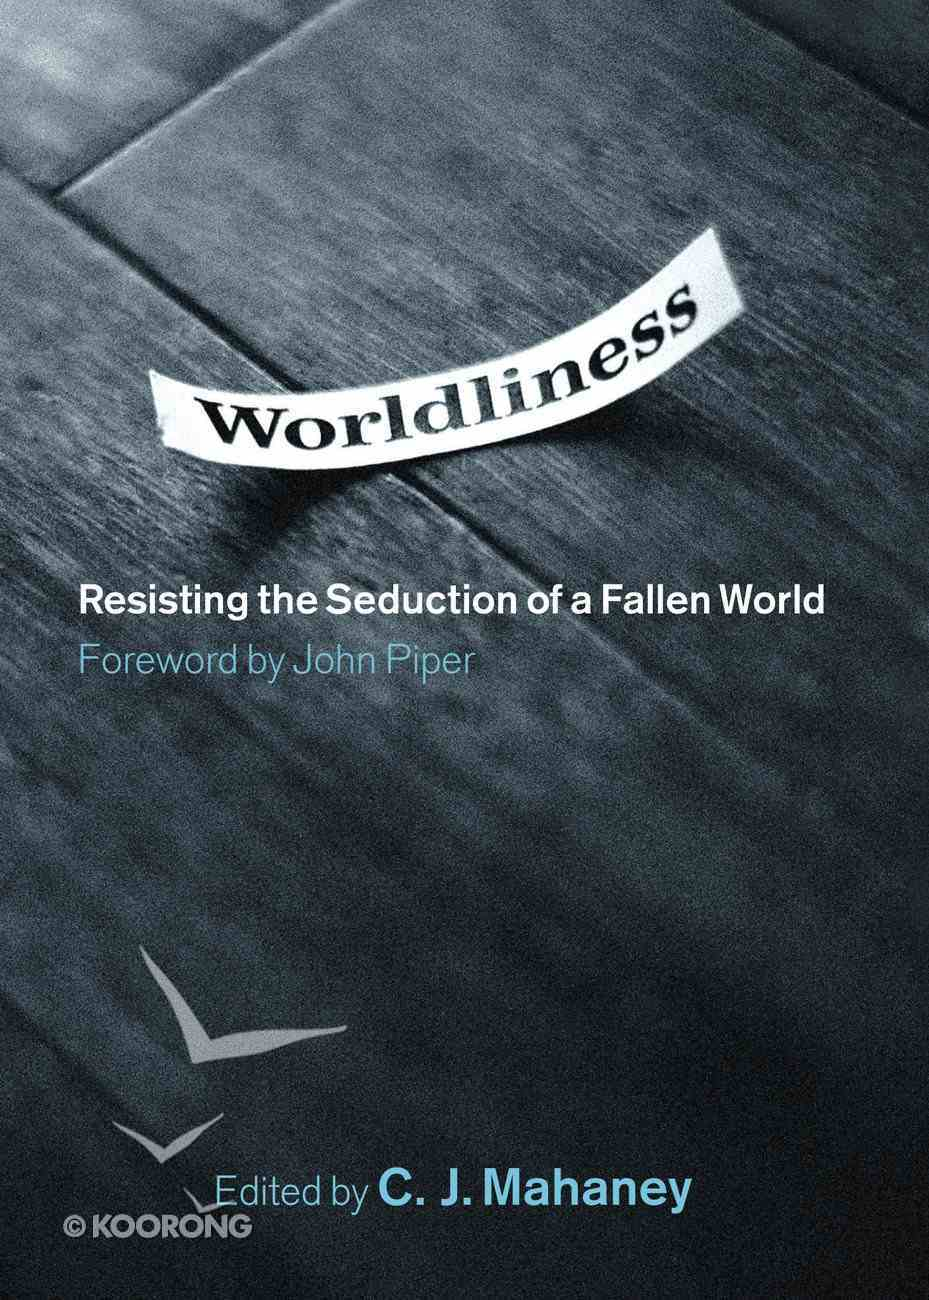 Worldliness eBook